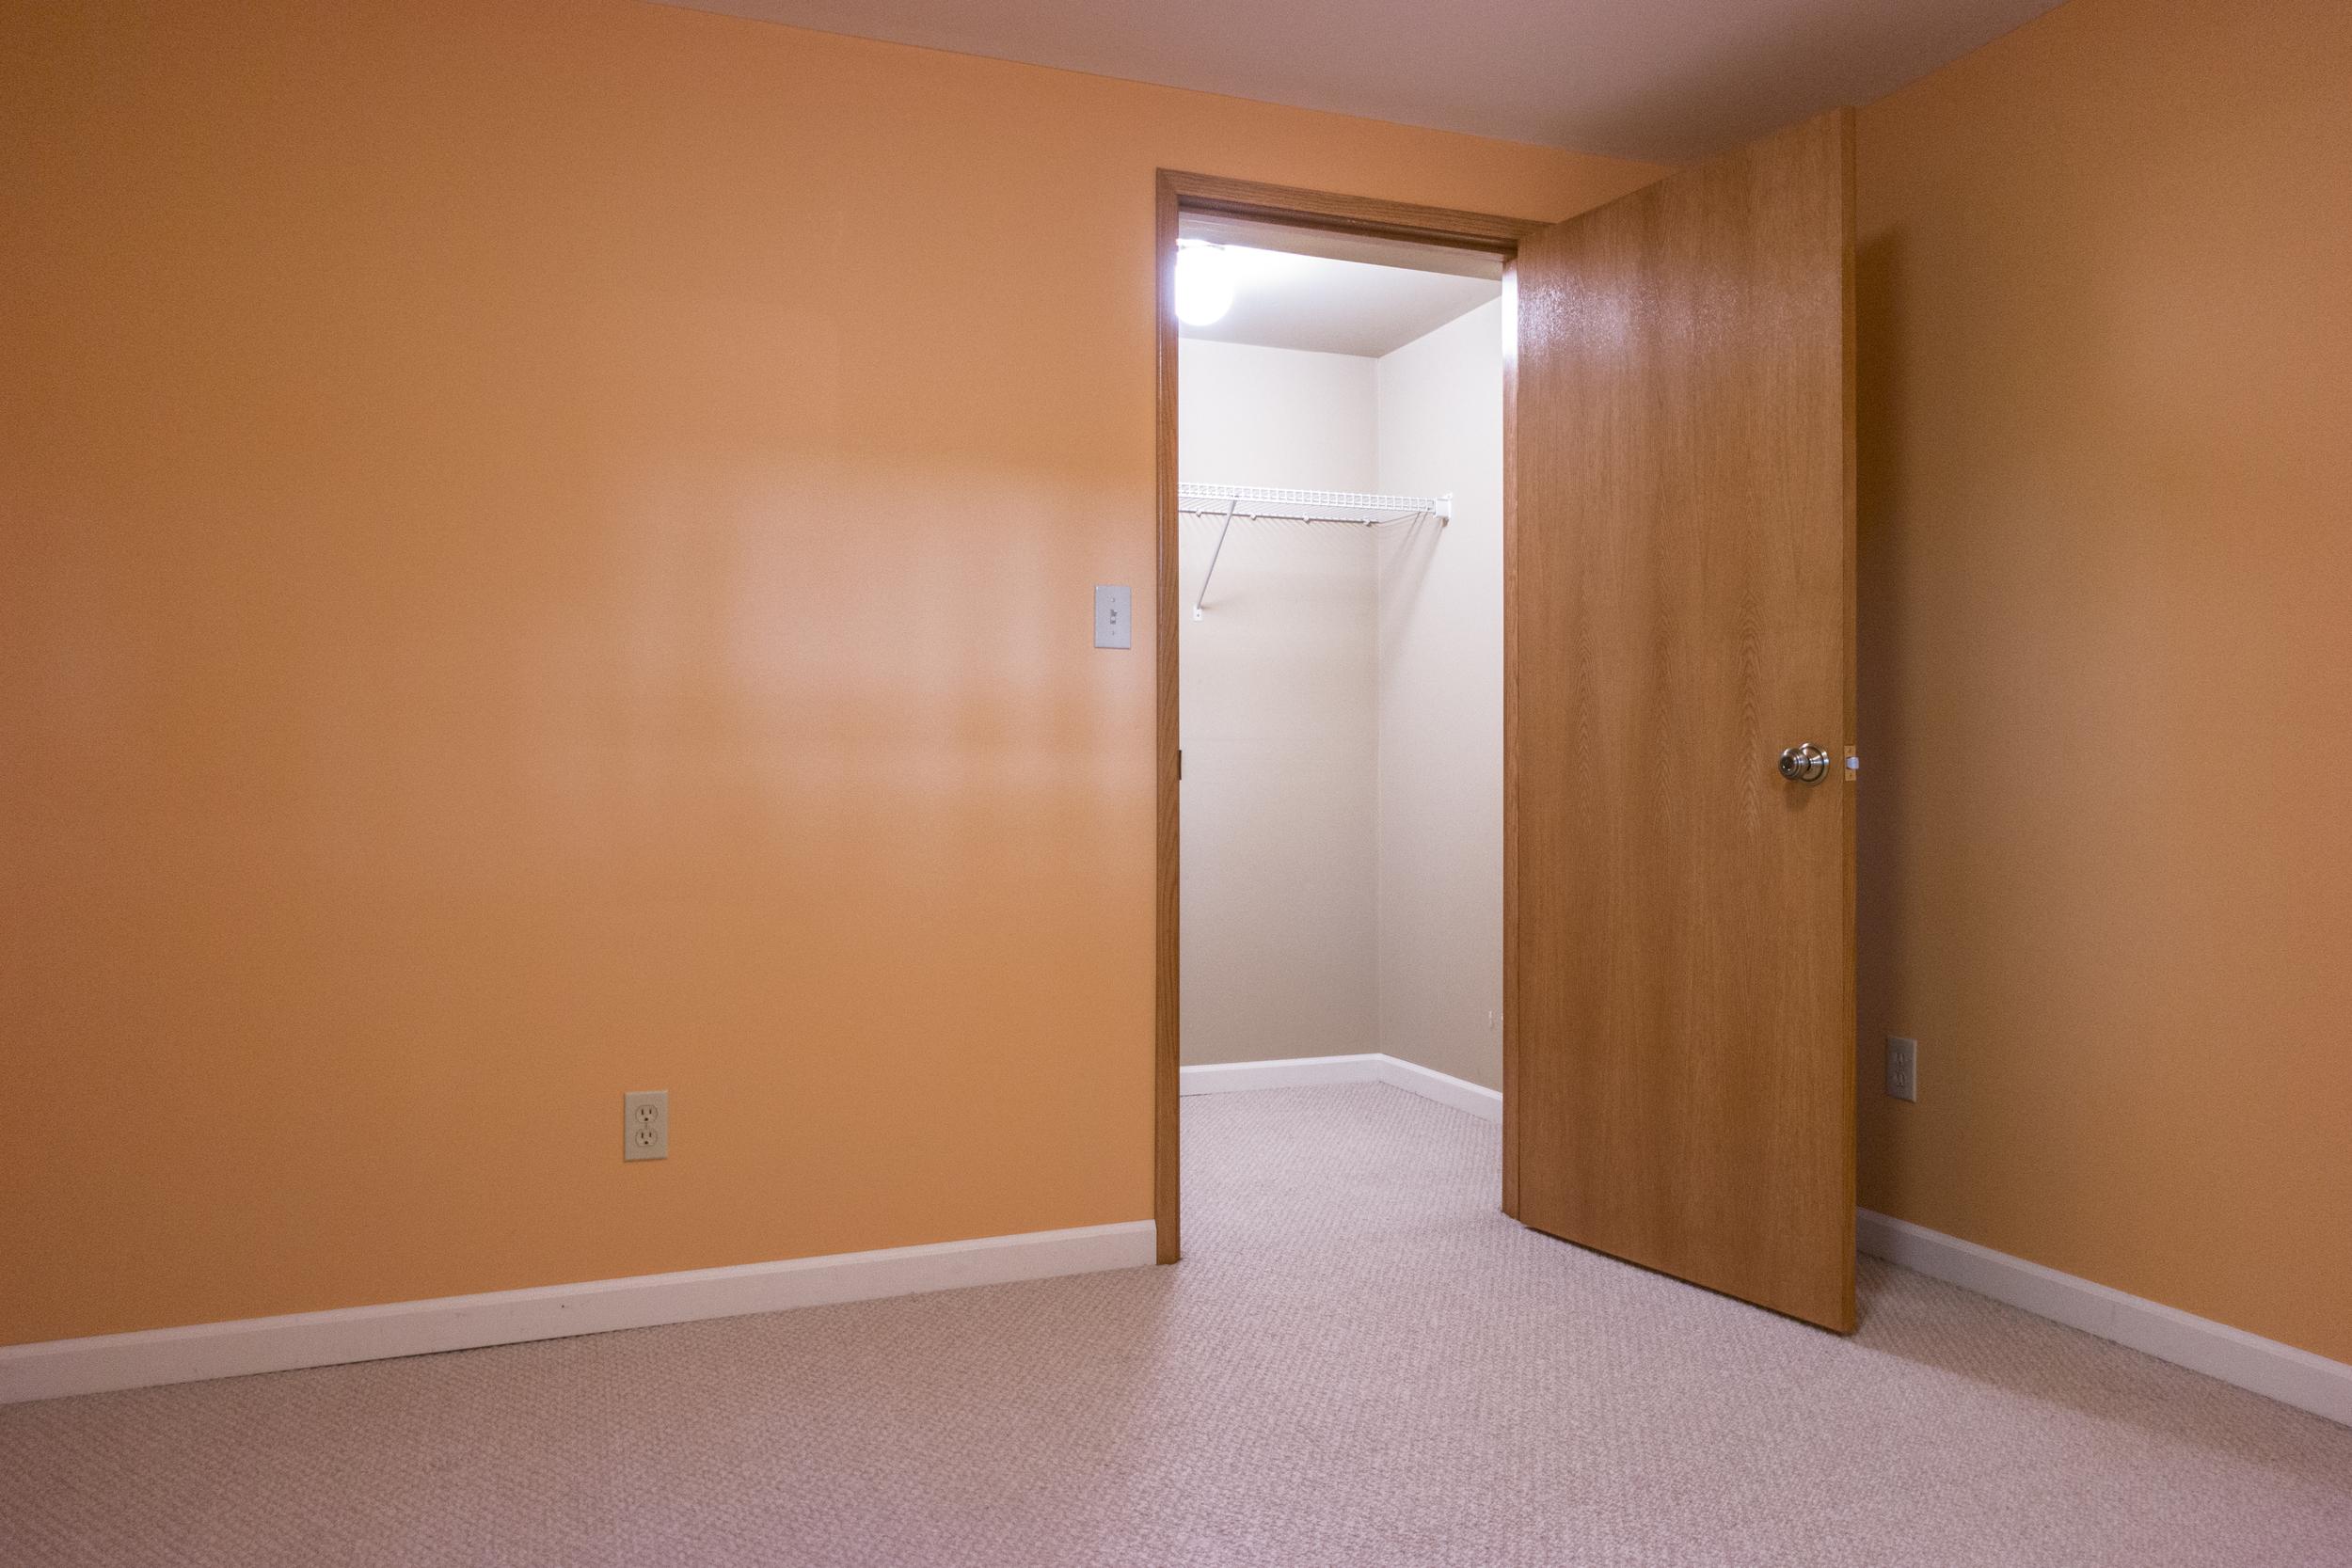 15 Bedroom3 01.jpg